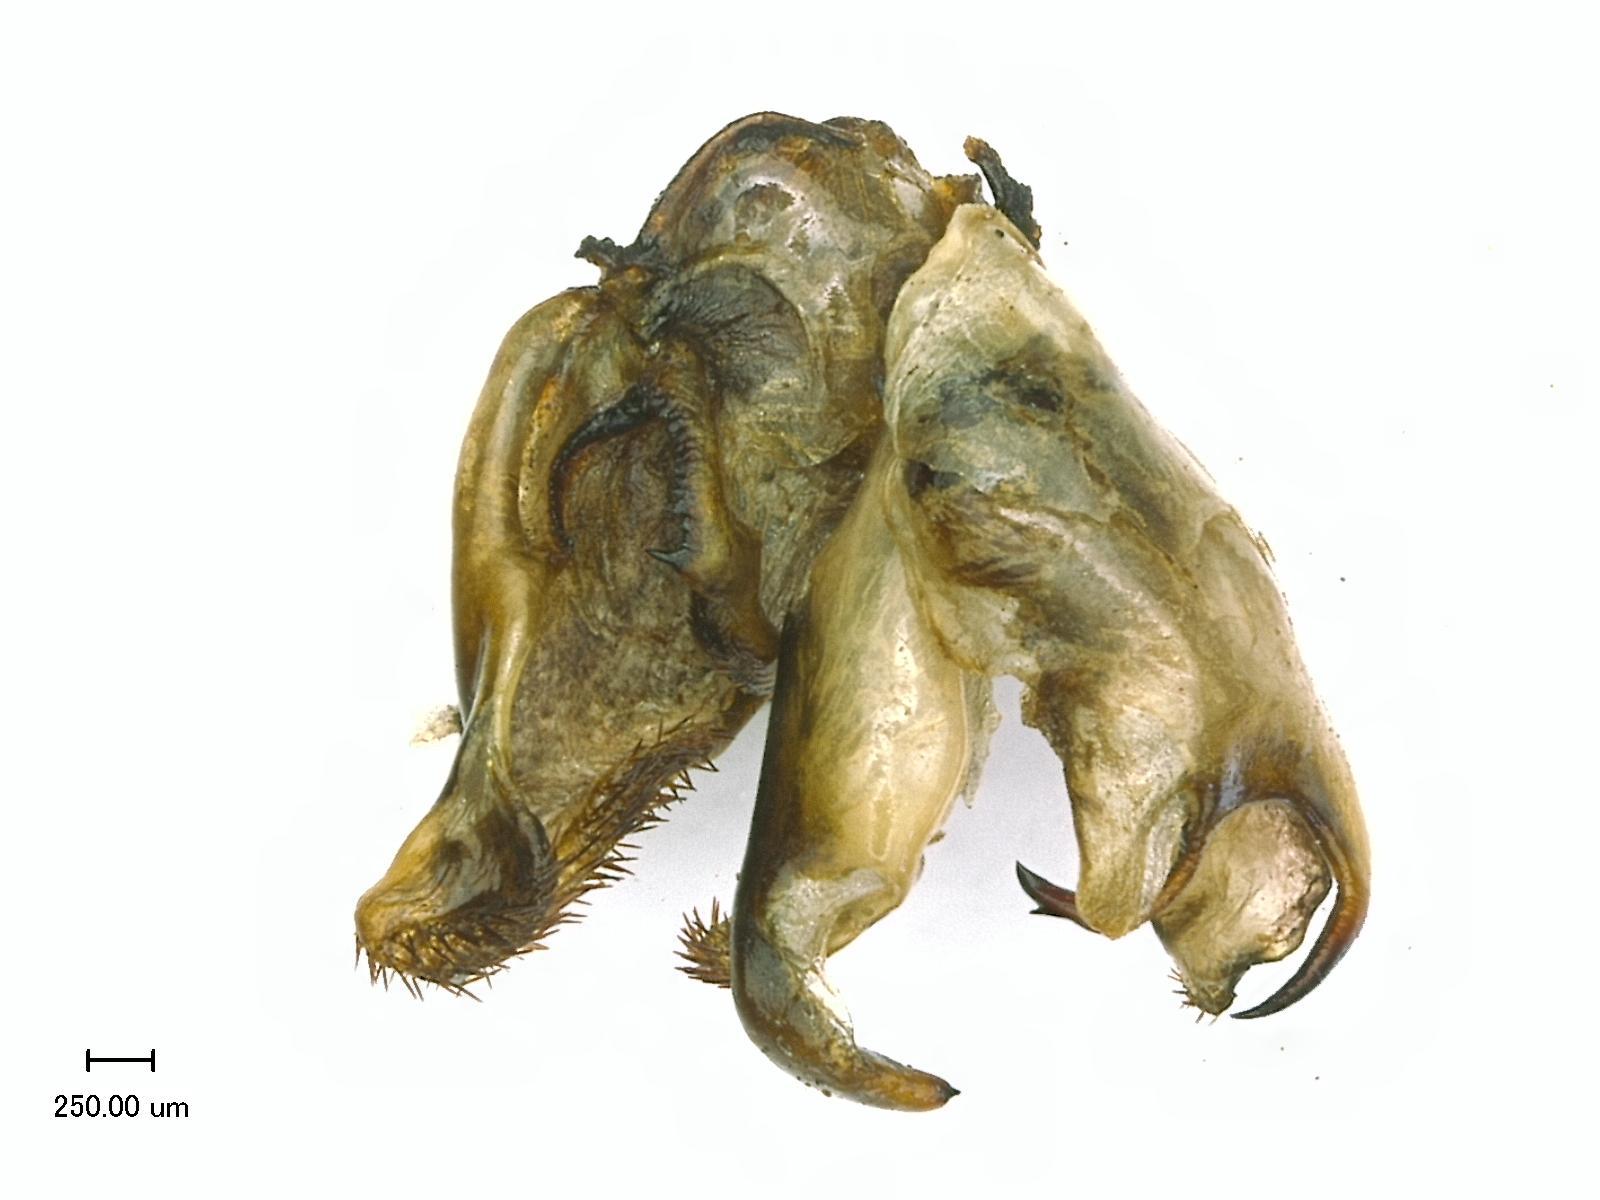 IGM 224, Pseudogalepsus nigricoxa